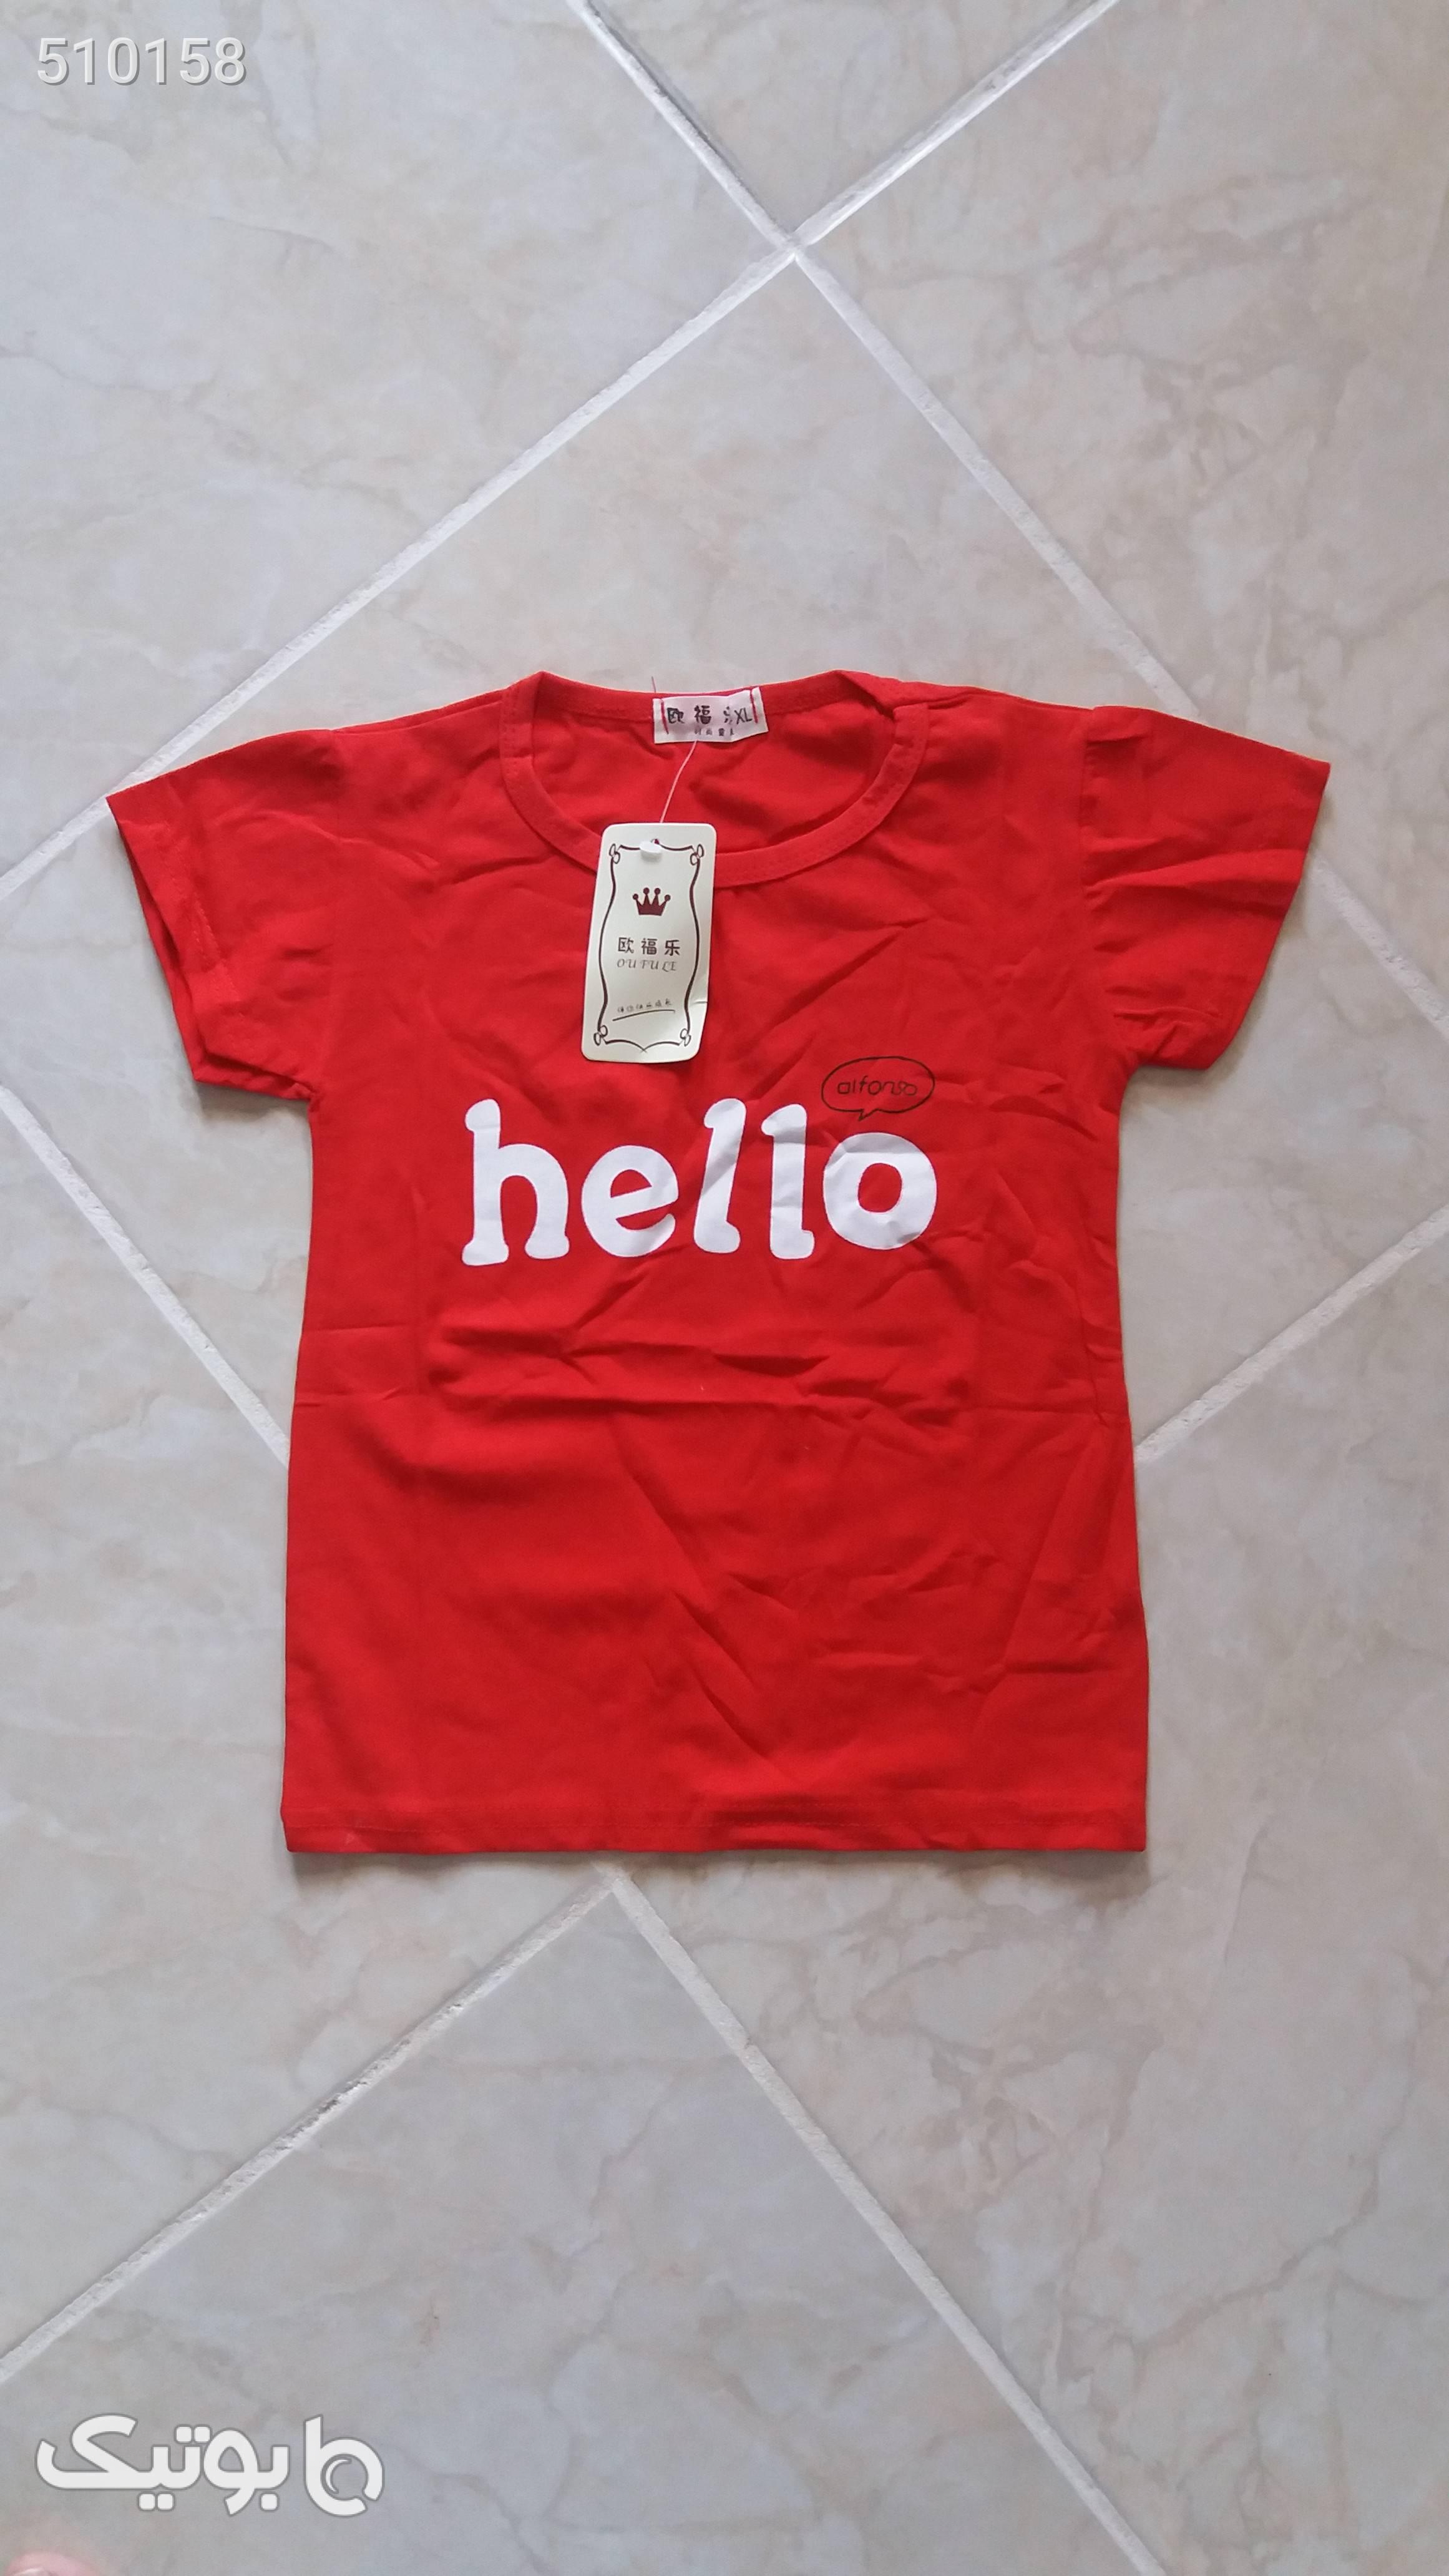 تی شرت پسرانه قرمز لباس کودک پسرانه